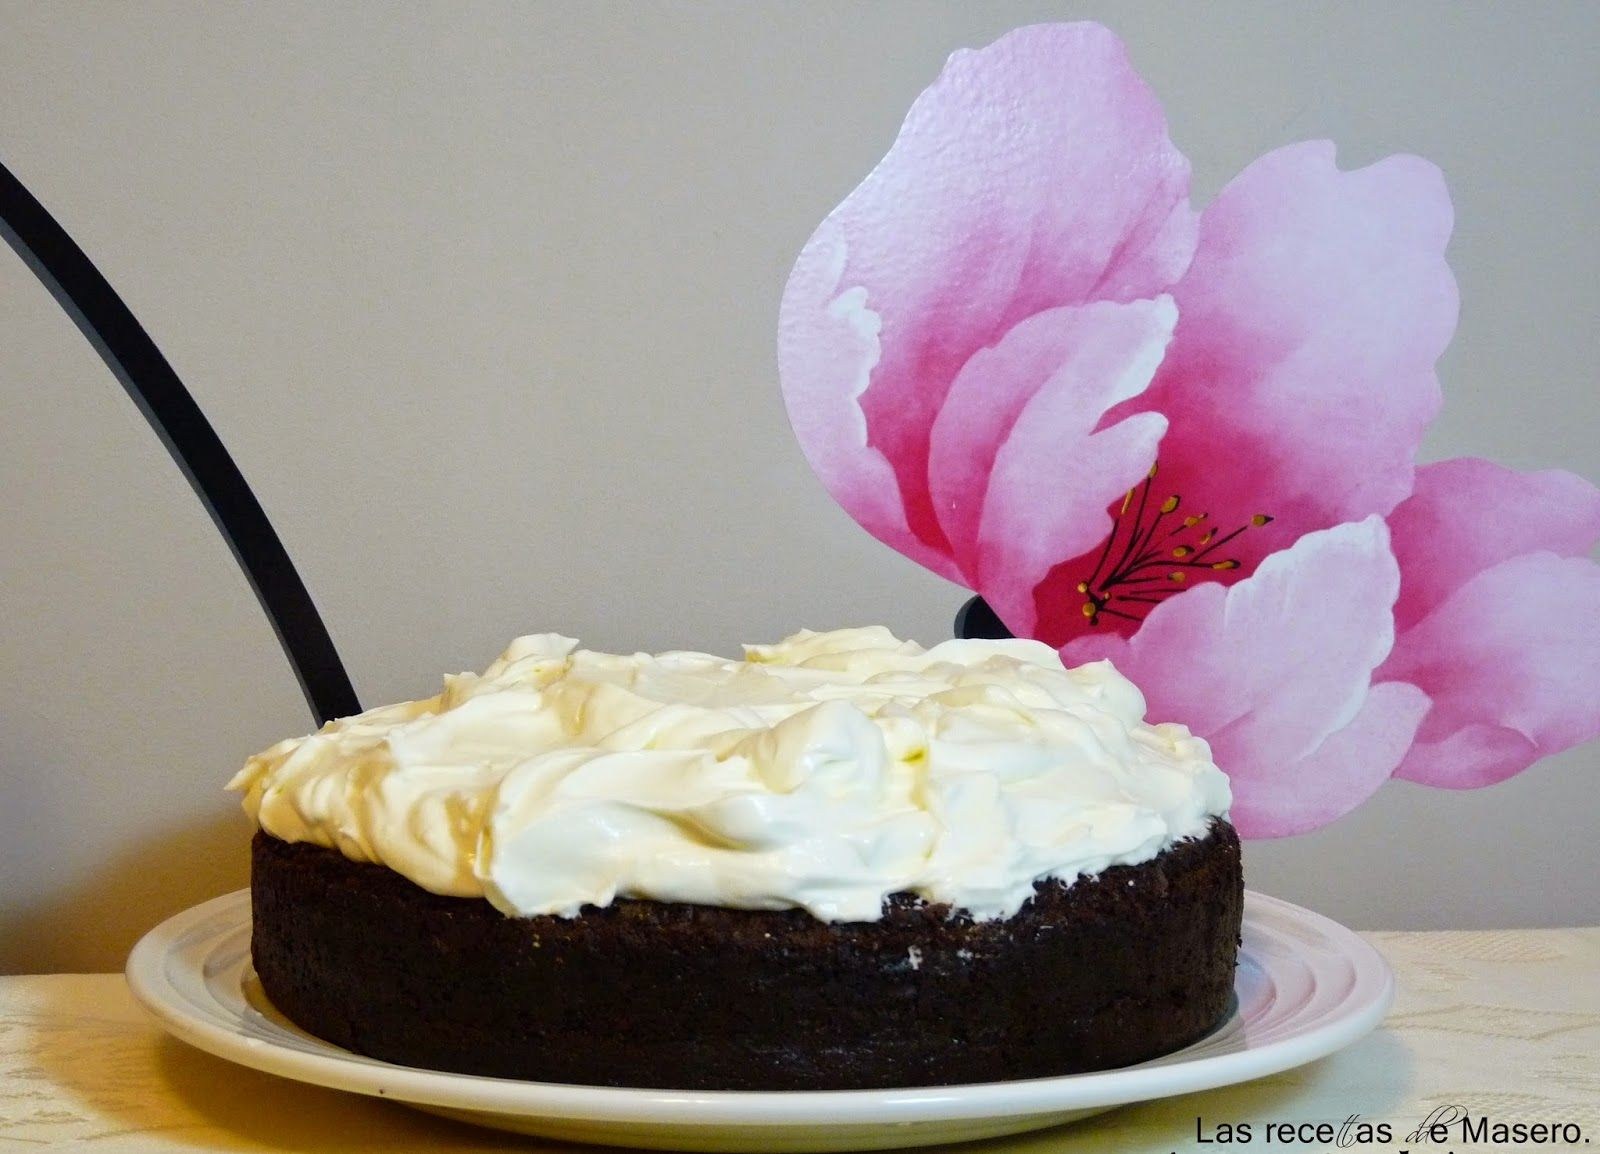 Las recetas de Masero: Tarta Guinness versión The Hummingbird Bakery